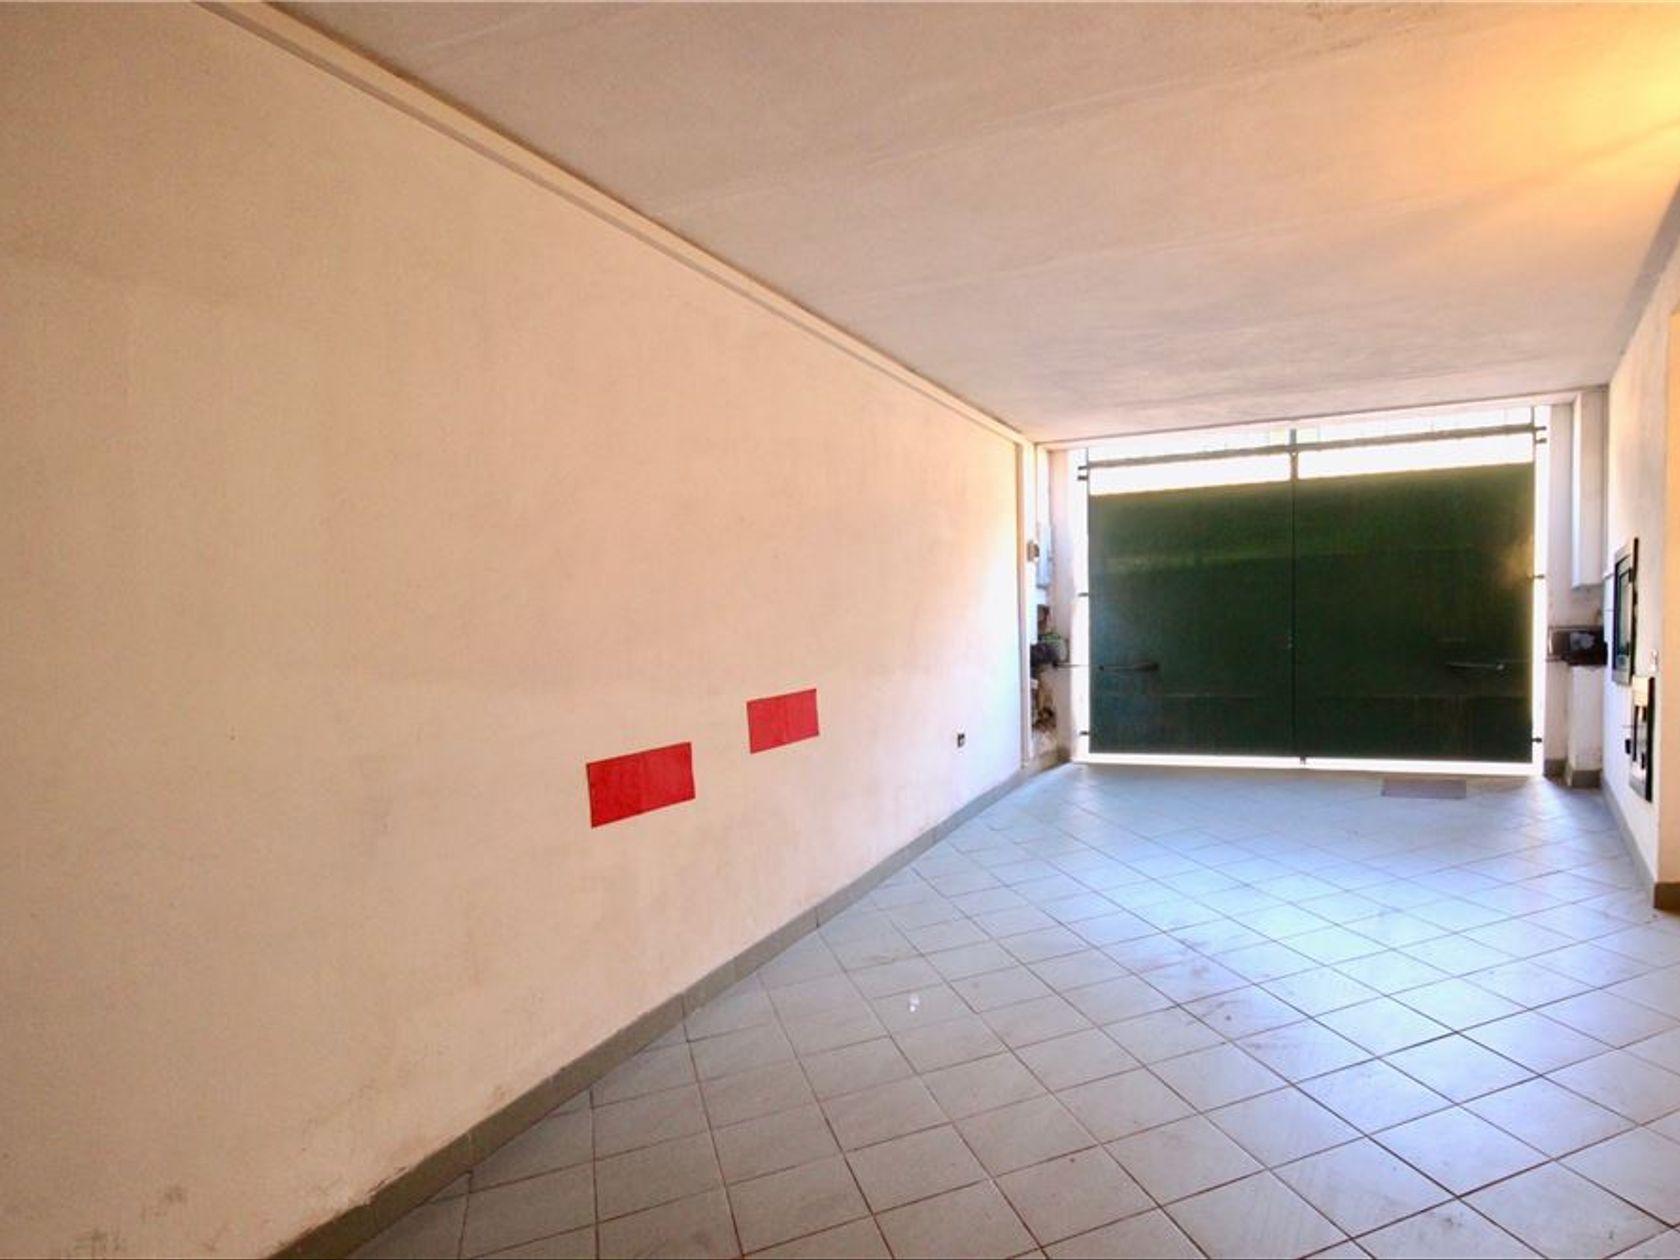 Appartamento Ss-centro, Sassari, SS Vendita - Foto 15